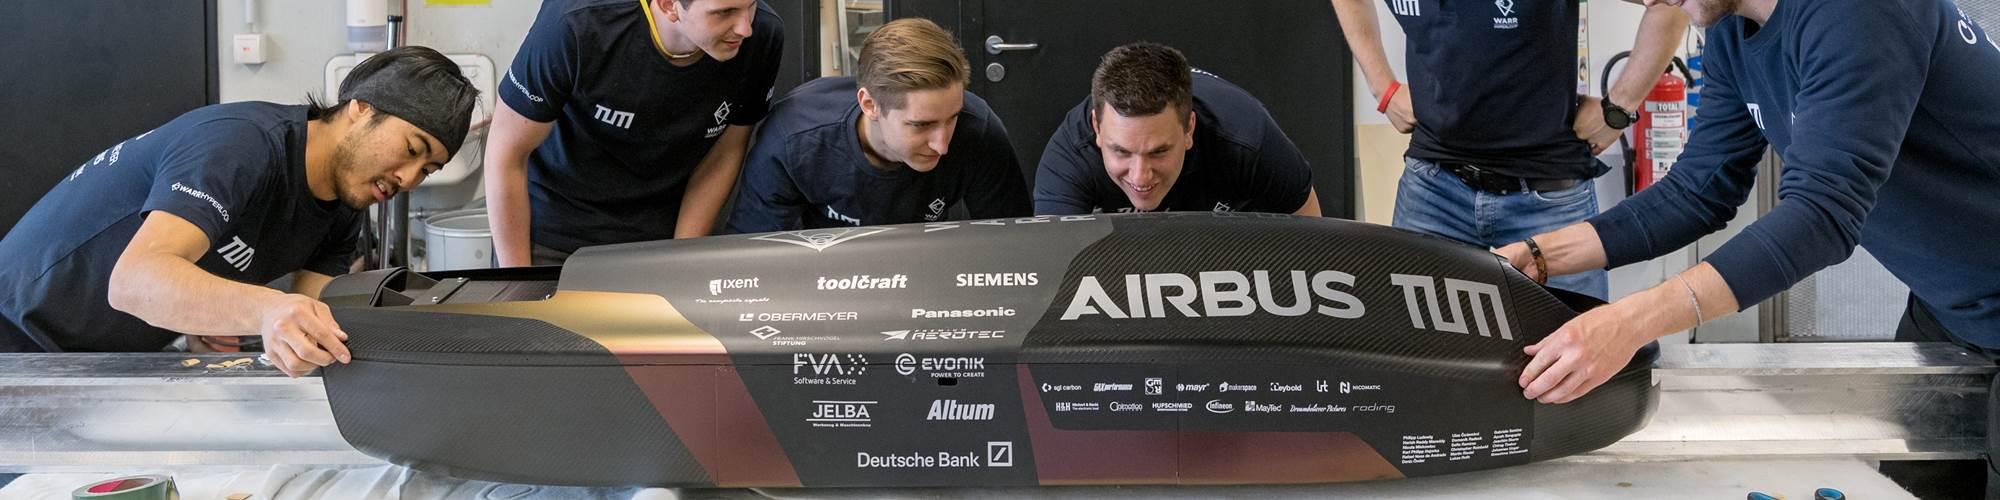 Hyperloop Pod中的Tu慕尼黑复合材料